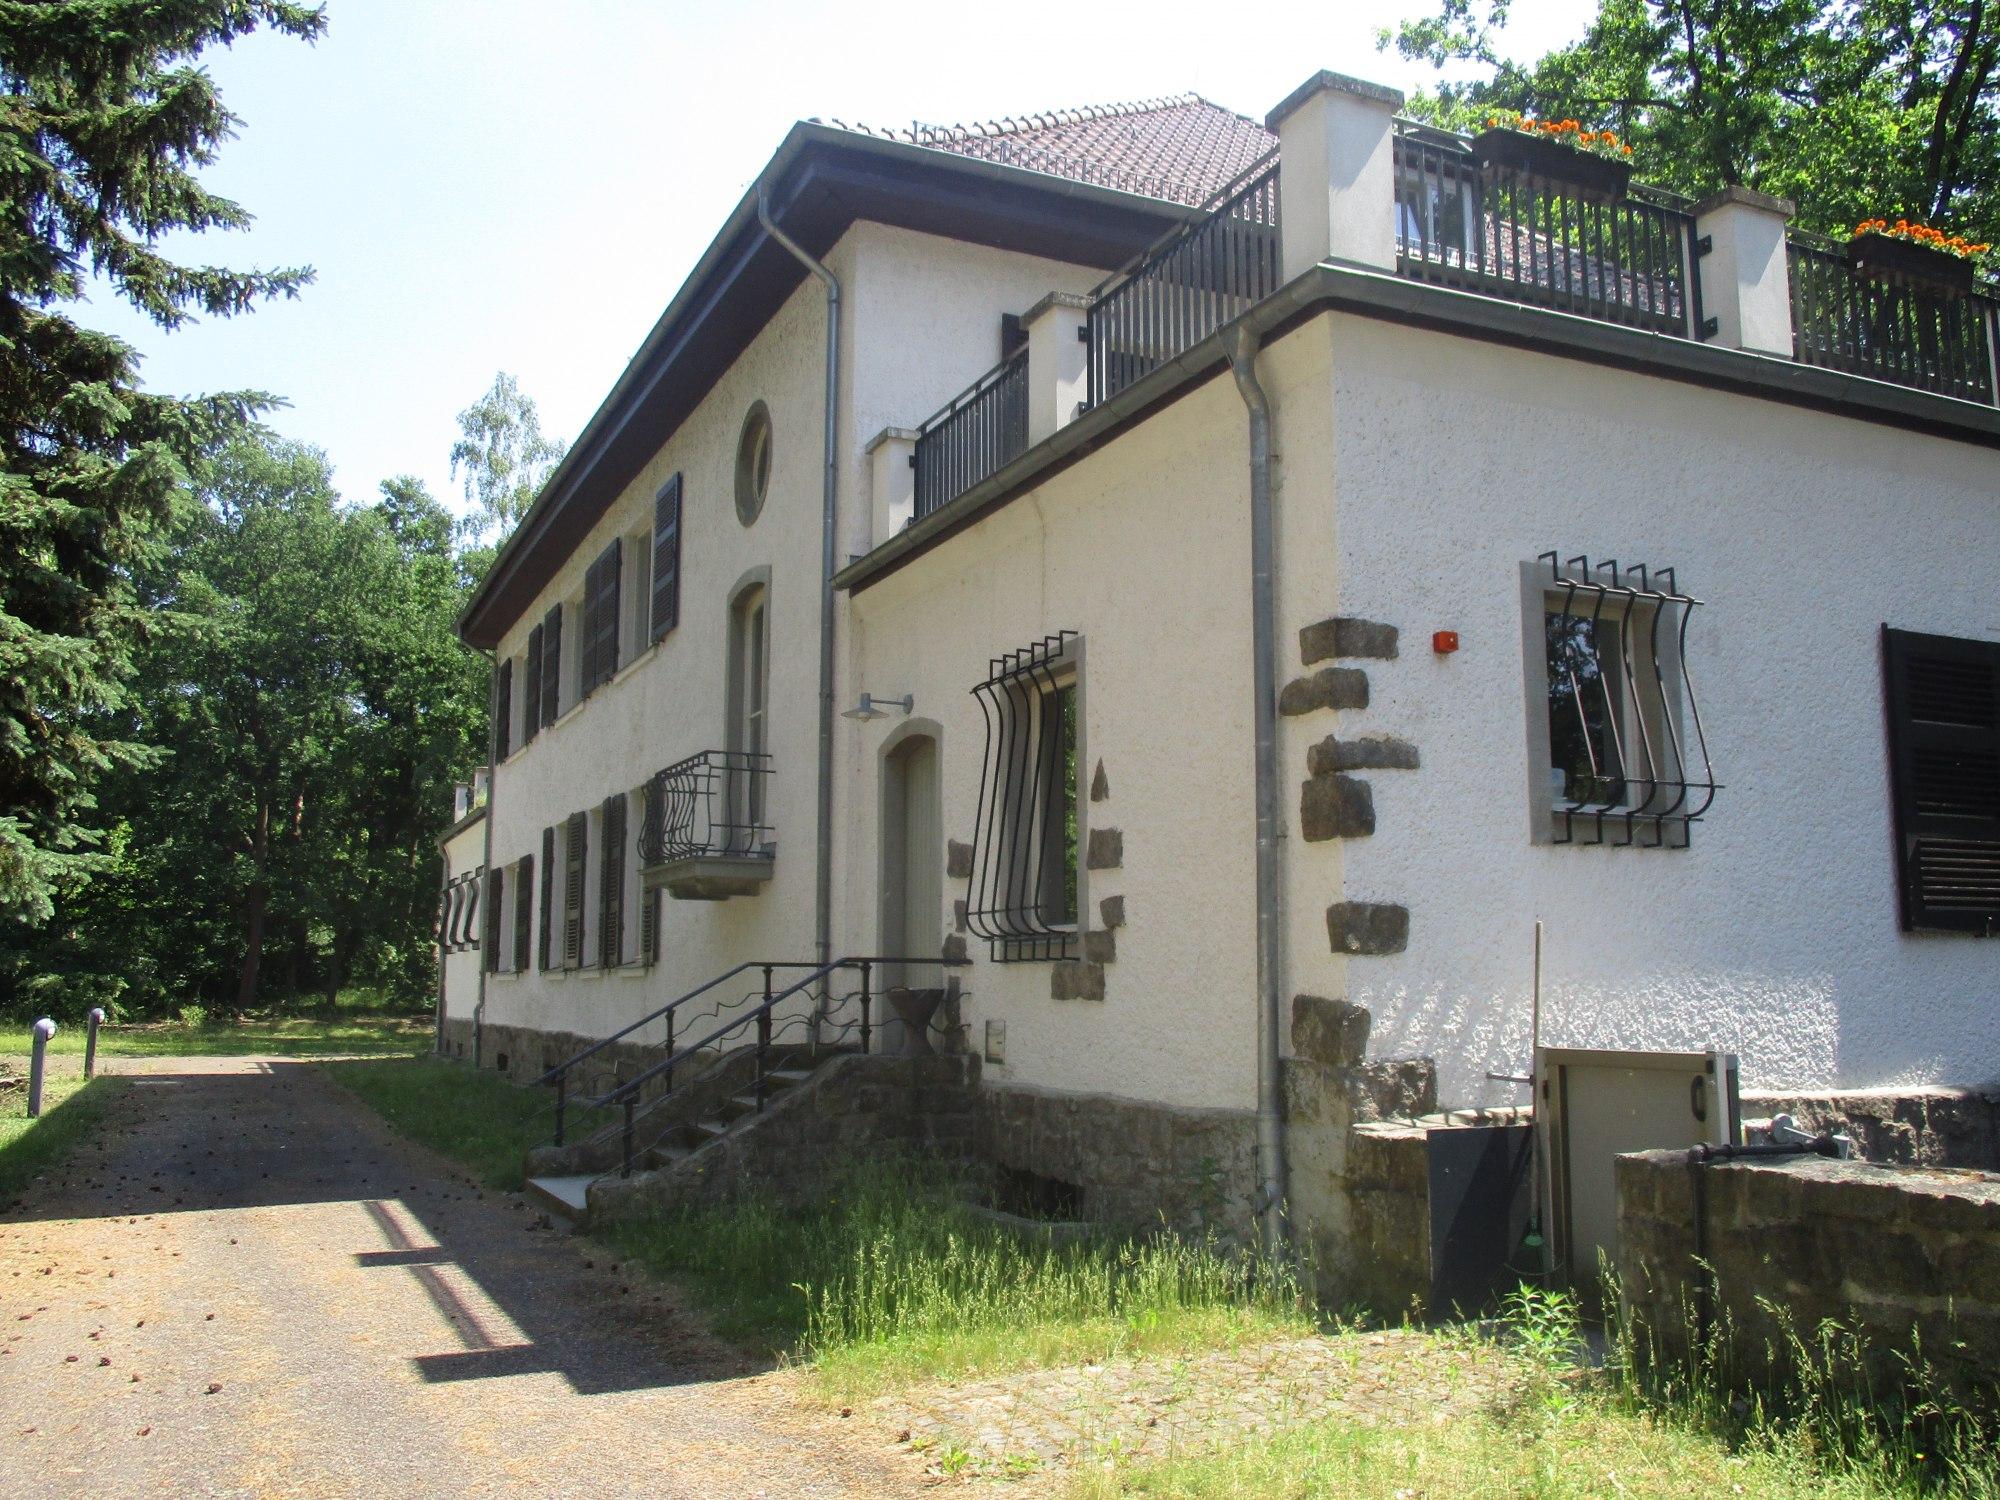 Theodor Eicke Villa